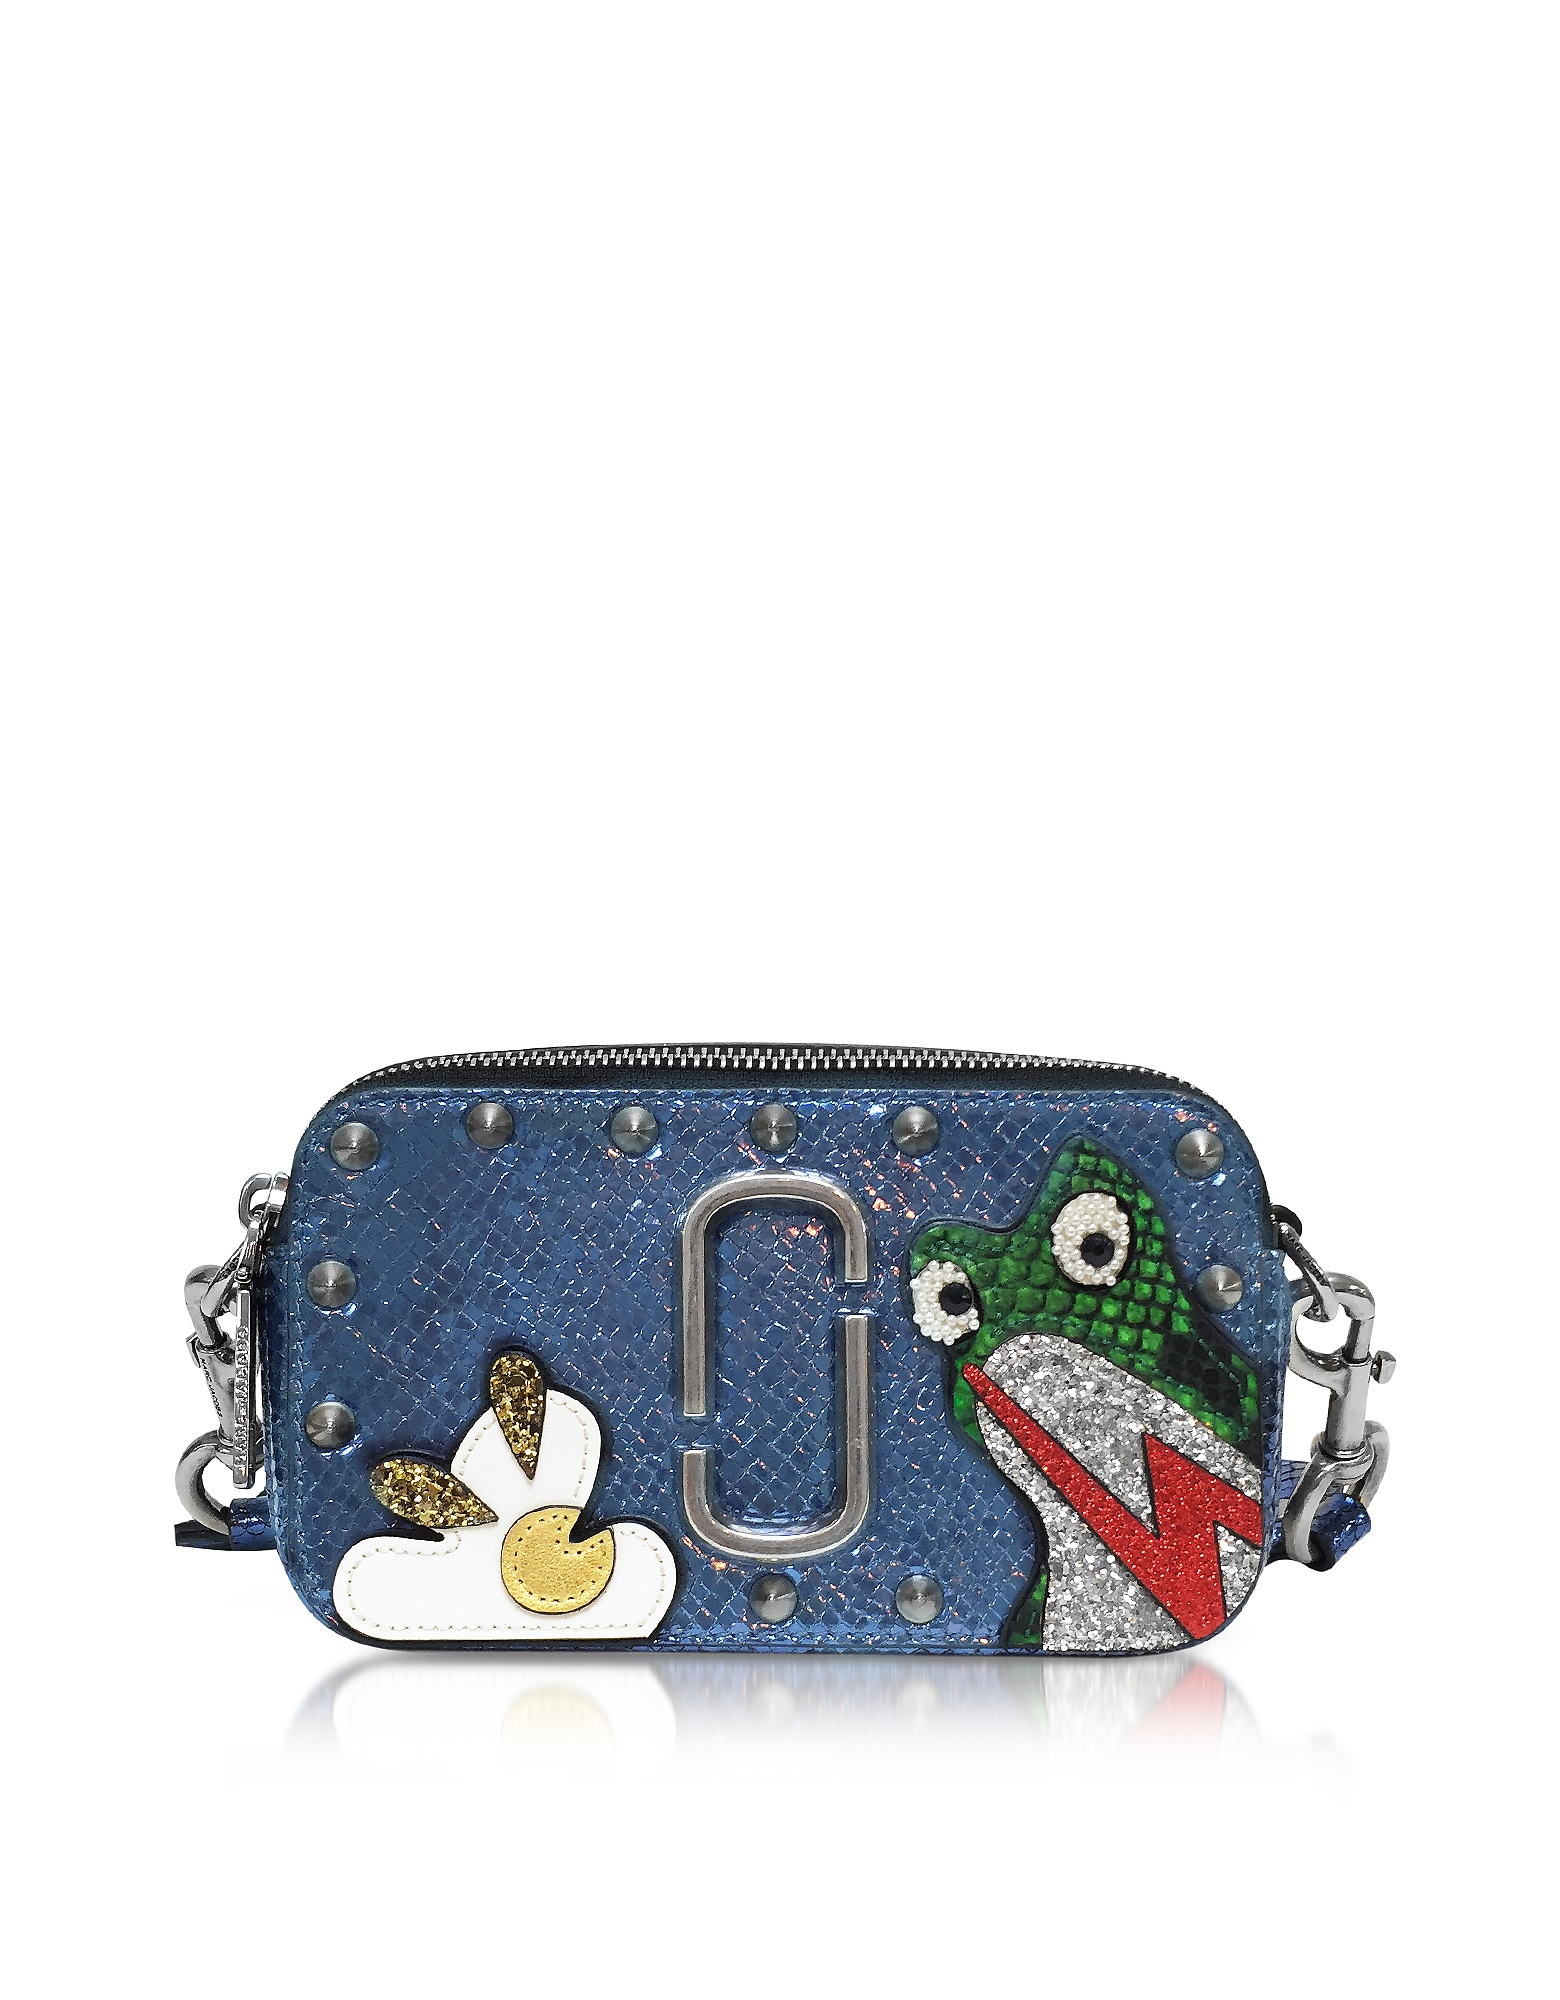 Marc Jacobs Snapshot Frog Camera Bag- Темно-синяя Кожаная Сумка на Плечо